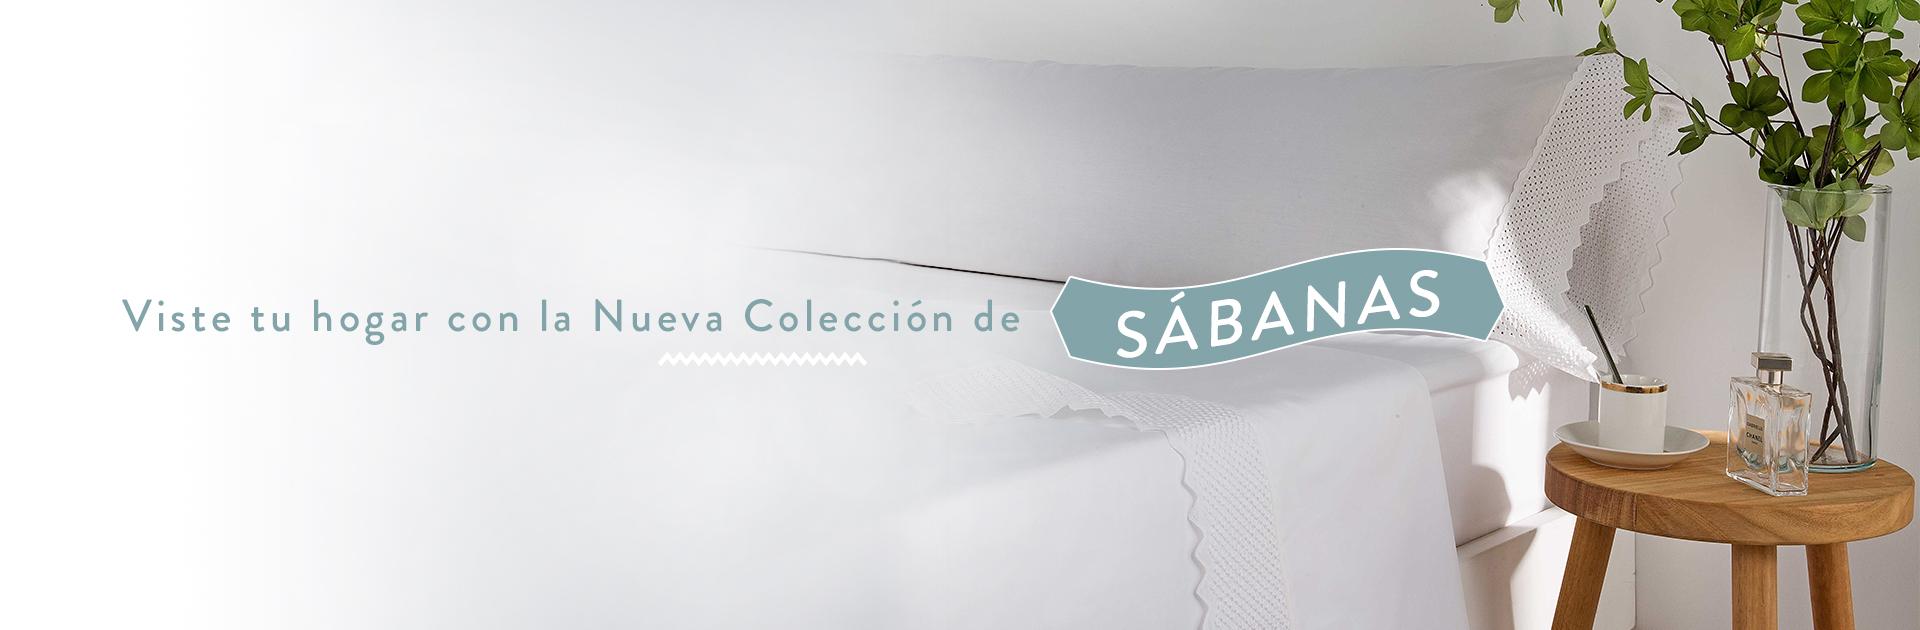 capritx_banner-web_sabanas_300320-copia